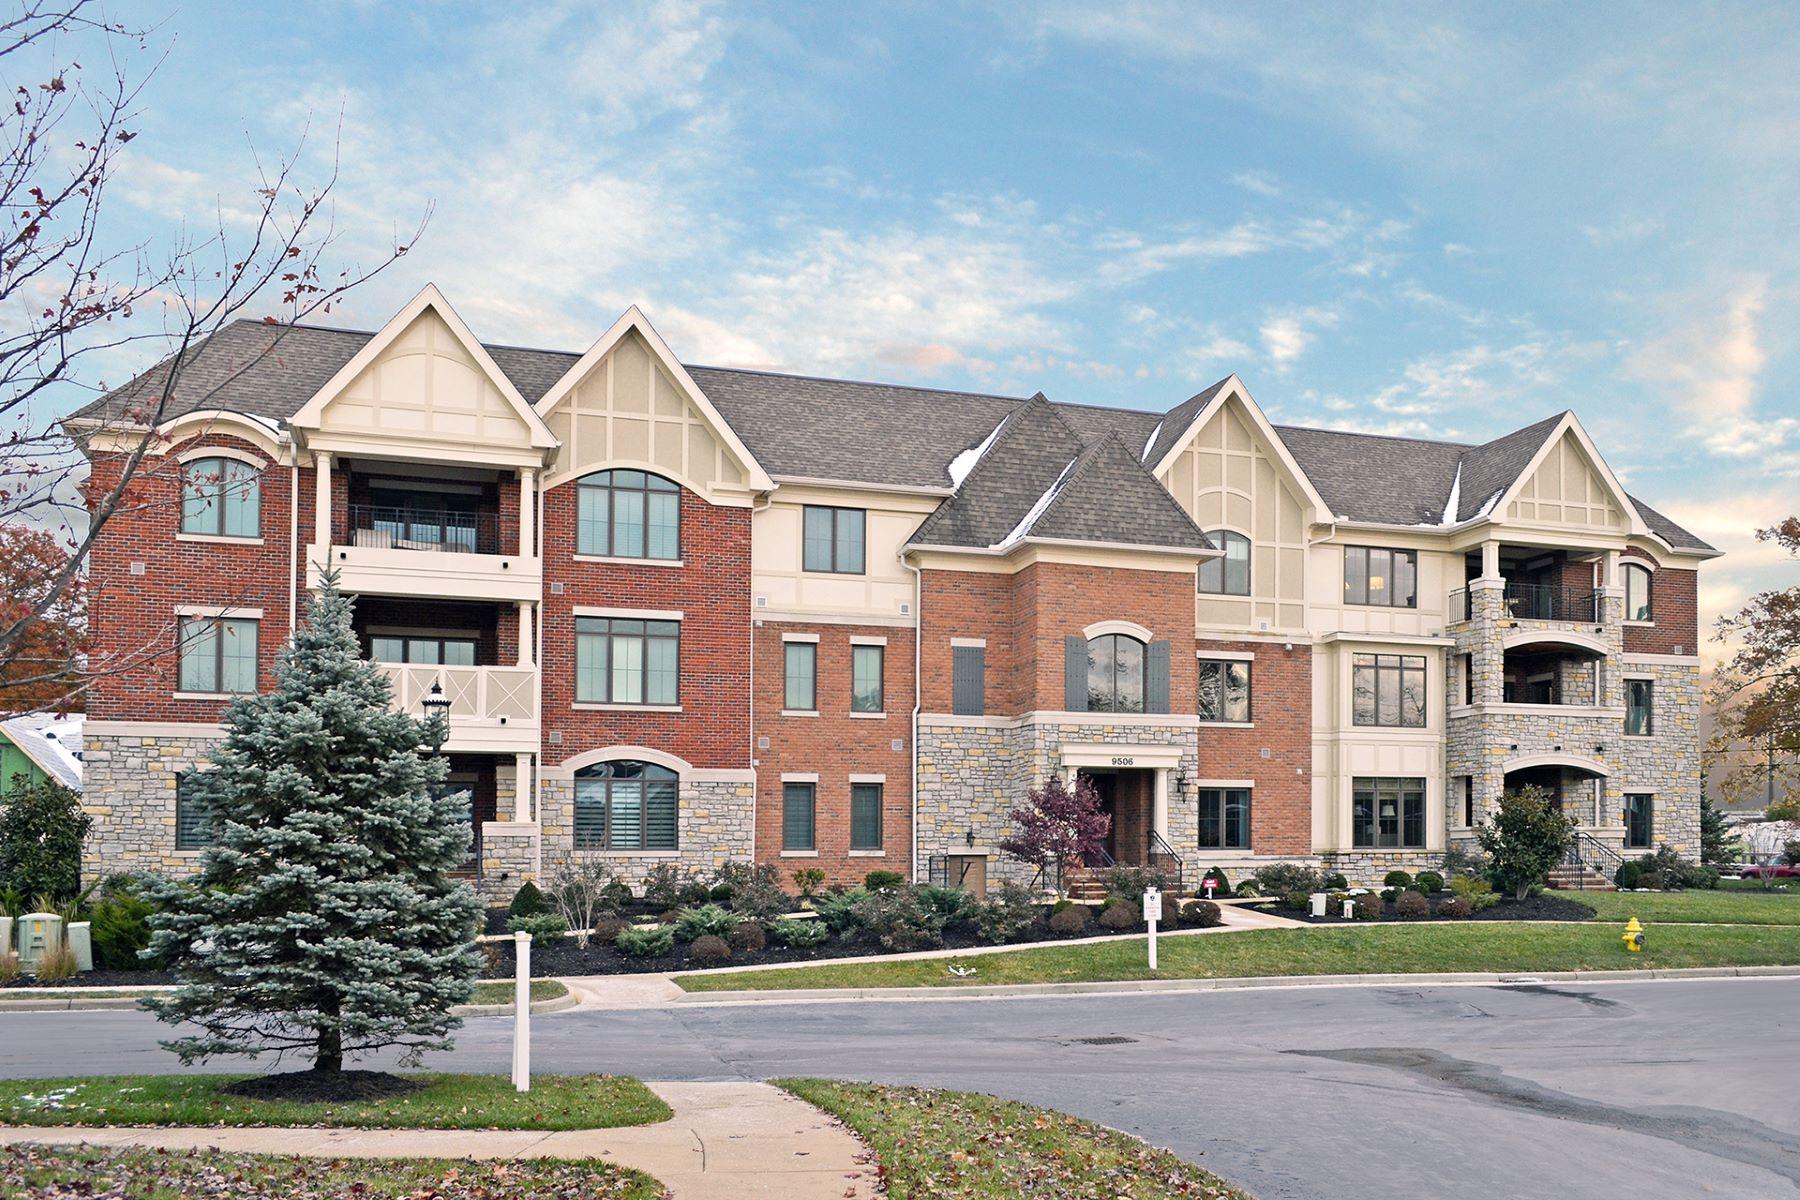 Condominiums for Sale at Better Than New Luxury Condo Living! 9506 Park Manor Blvd. #304 Cincinnati, Ohio 45242 United States